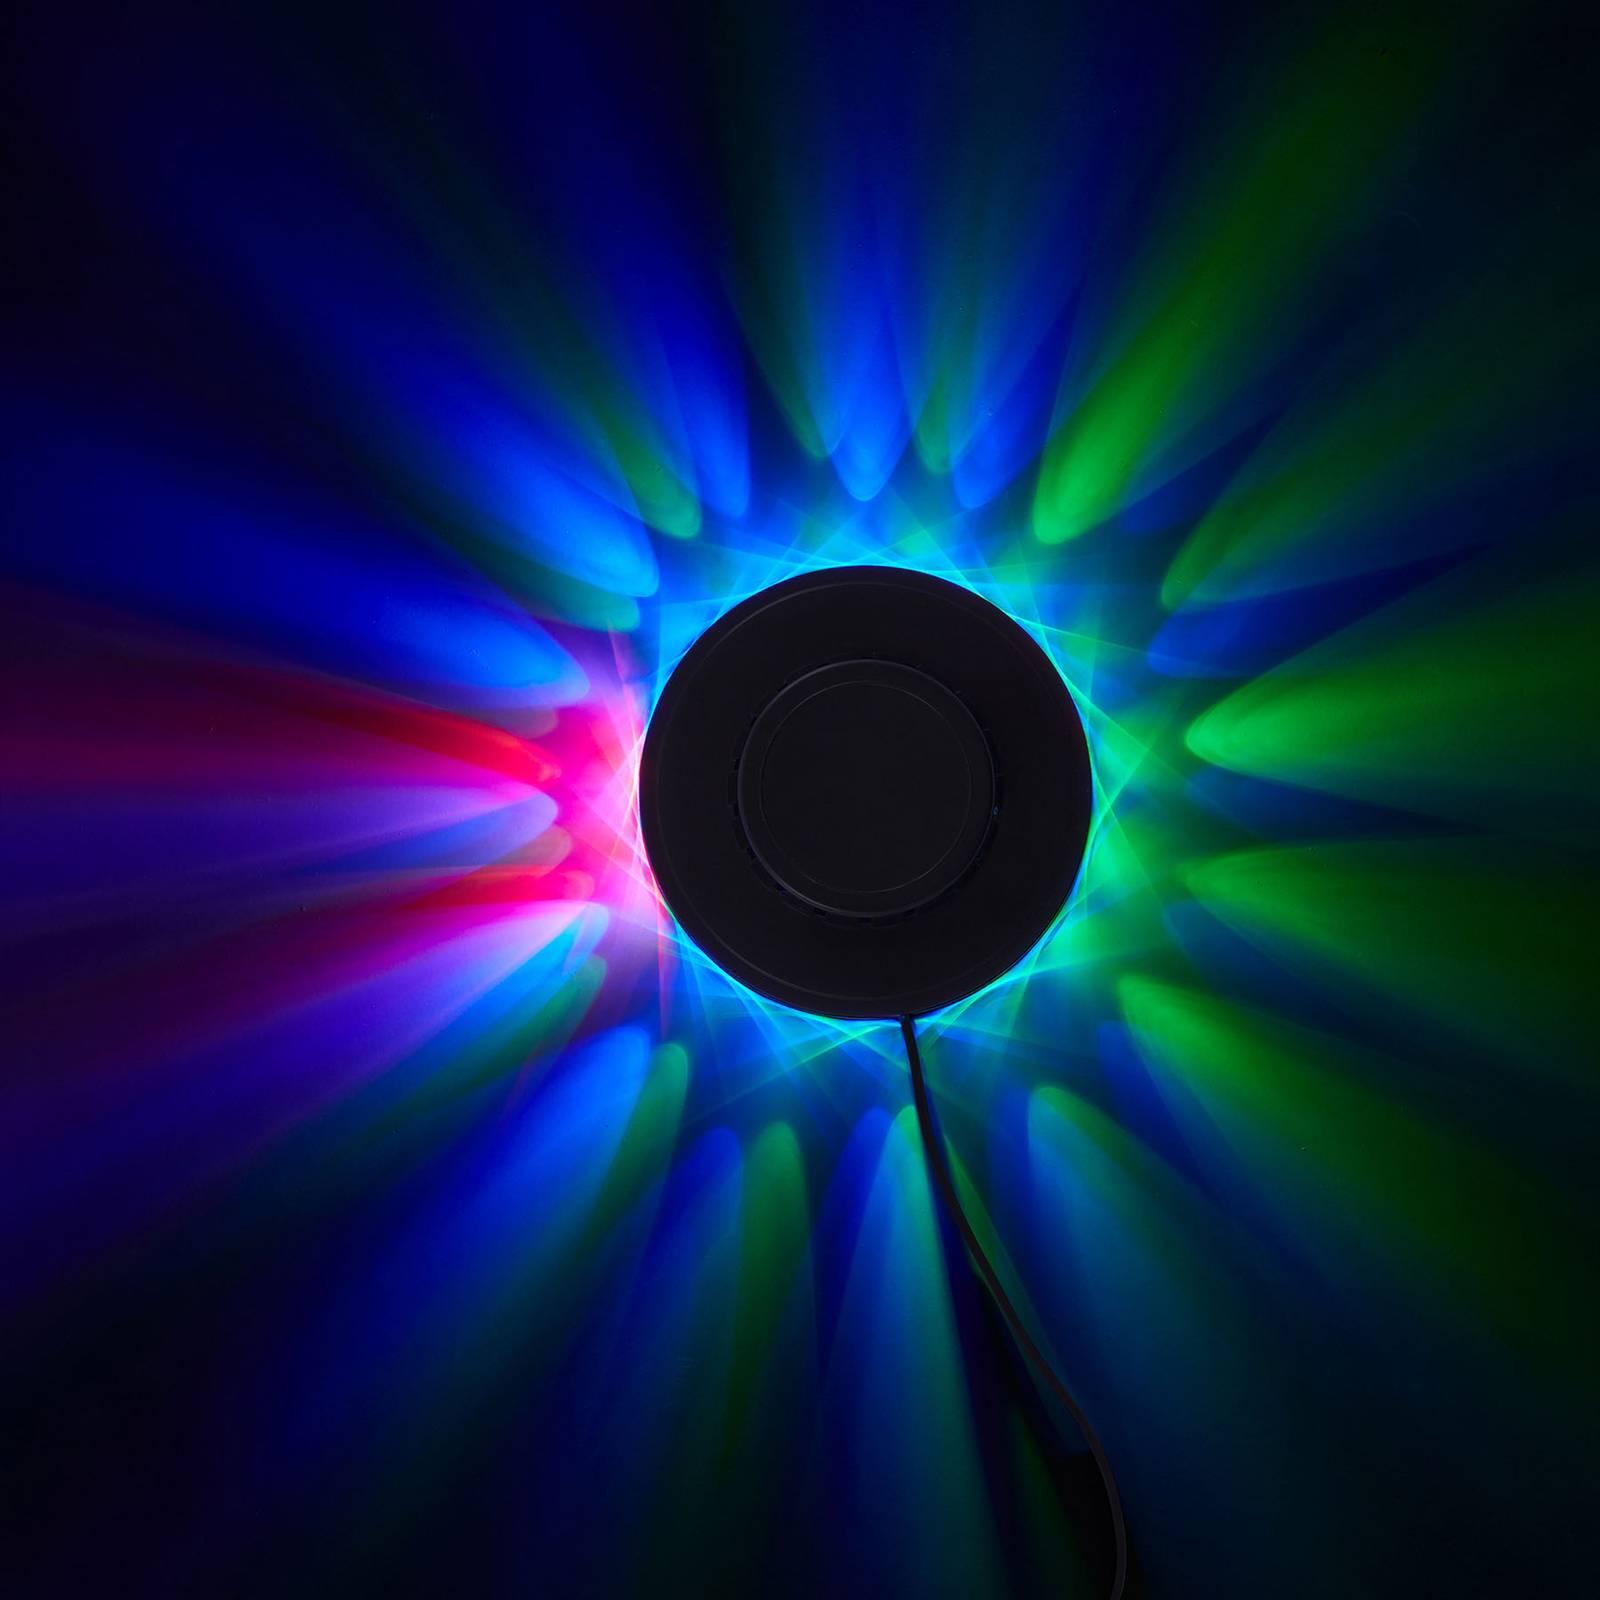 RGB-LED-valopyörä, koristevalo ja musiikkisensori